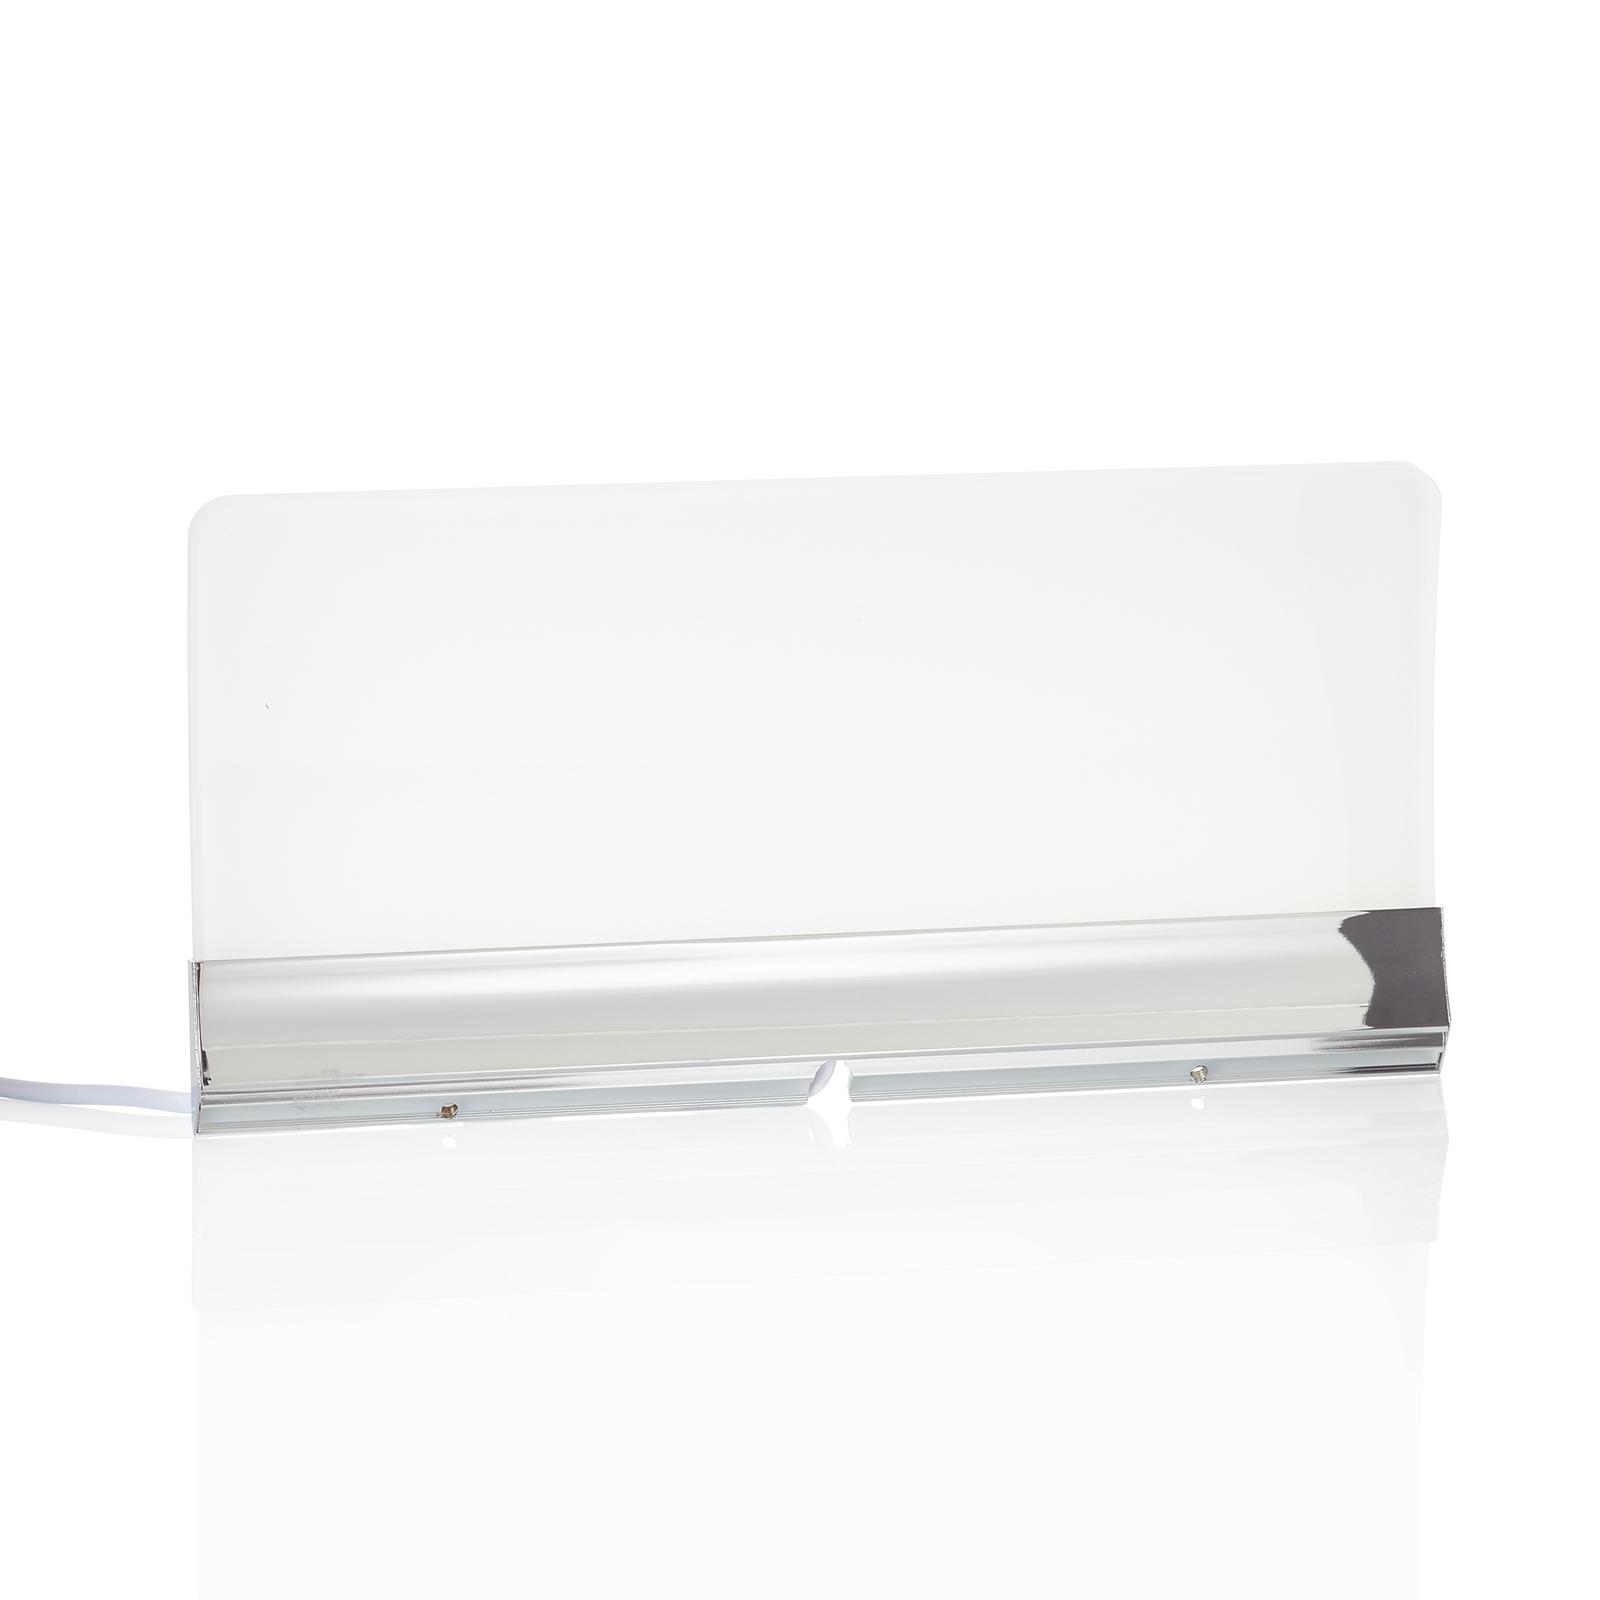 Plošné LED svítidlo nad zrcadlo Angela IP44, 30 cm